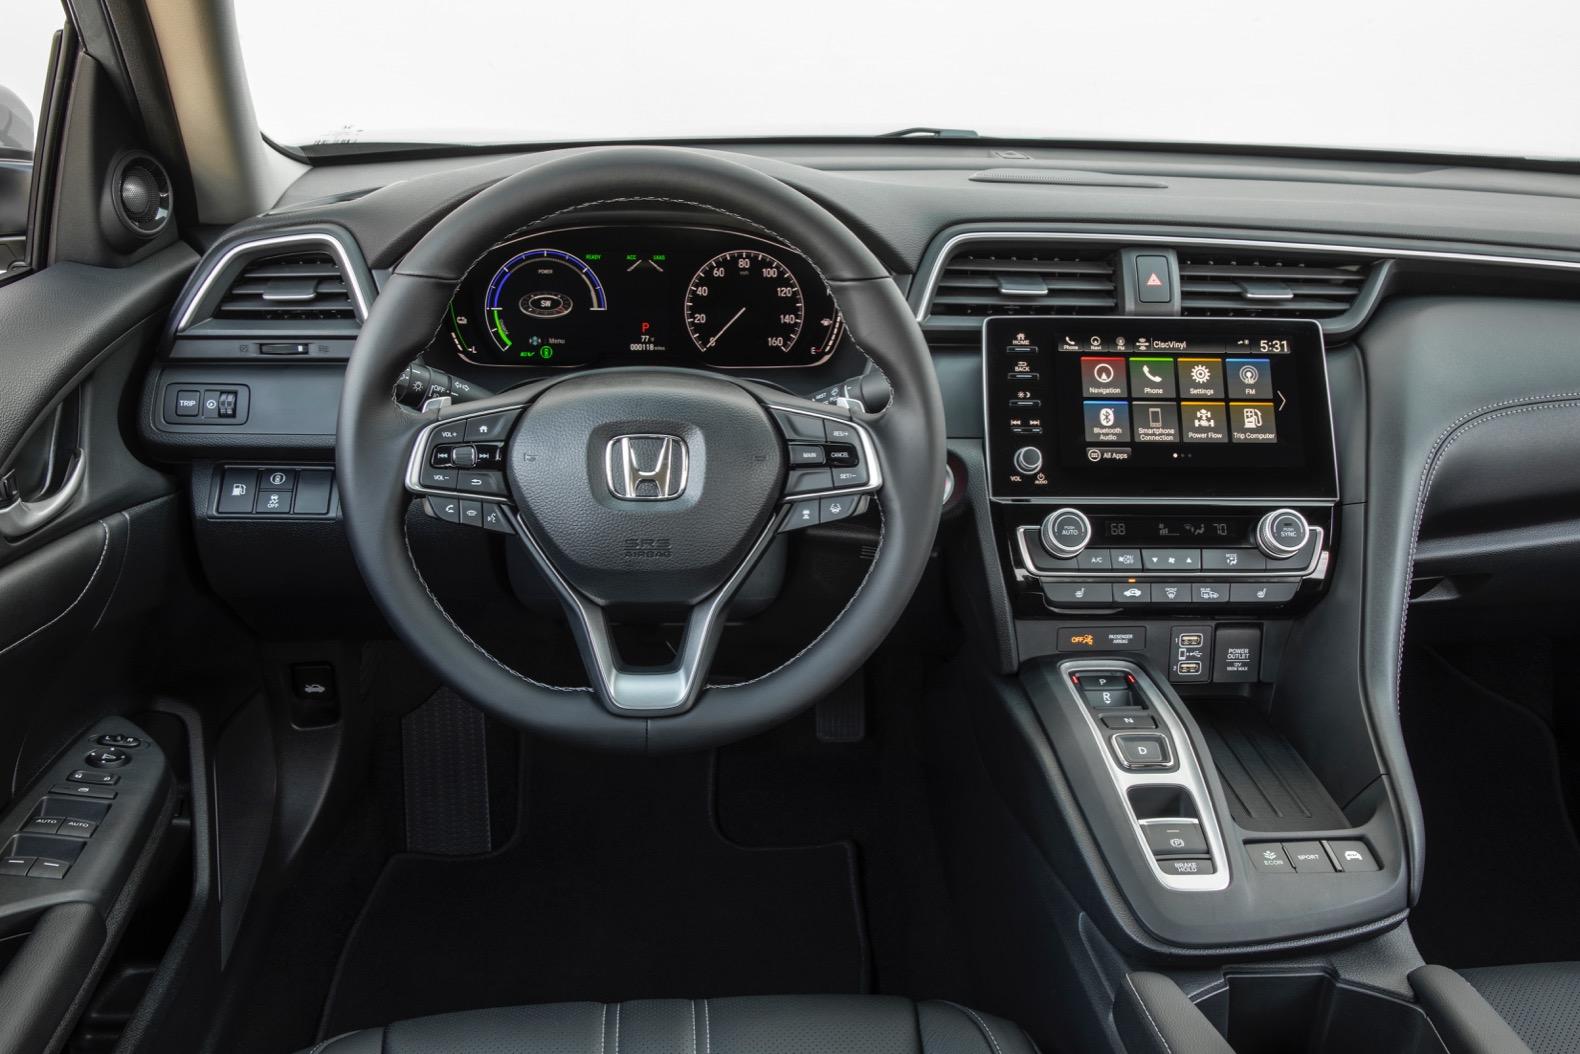 2020 Honda Insight starts at $23,860 | The Torque Report